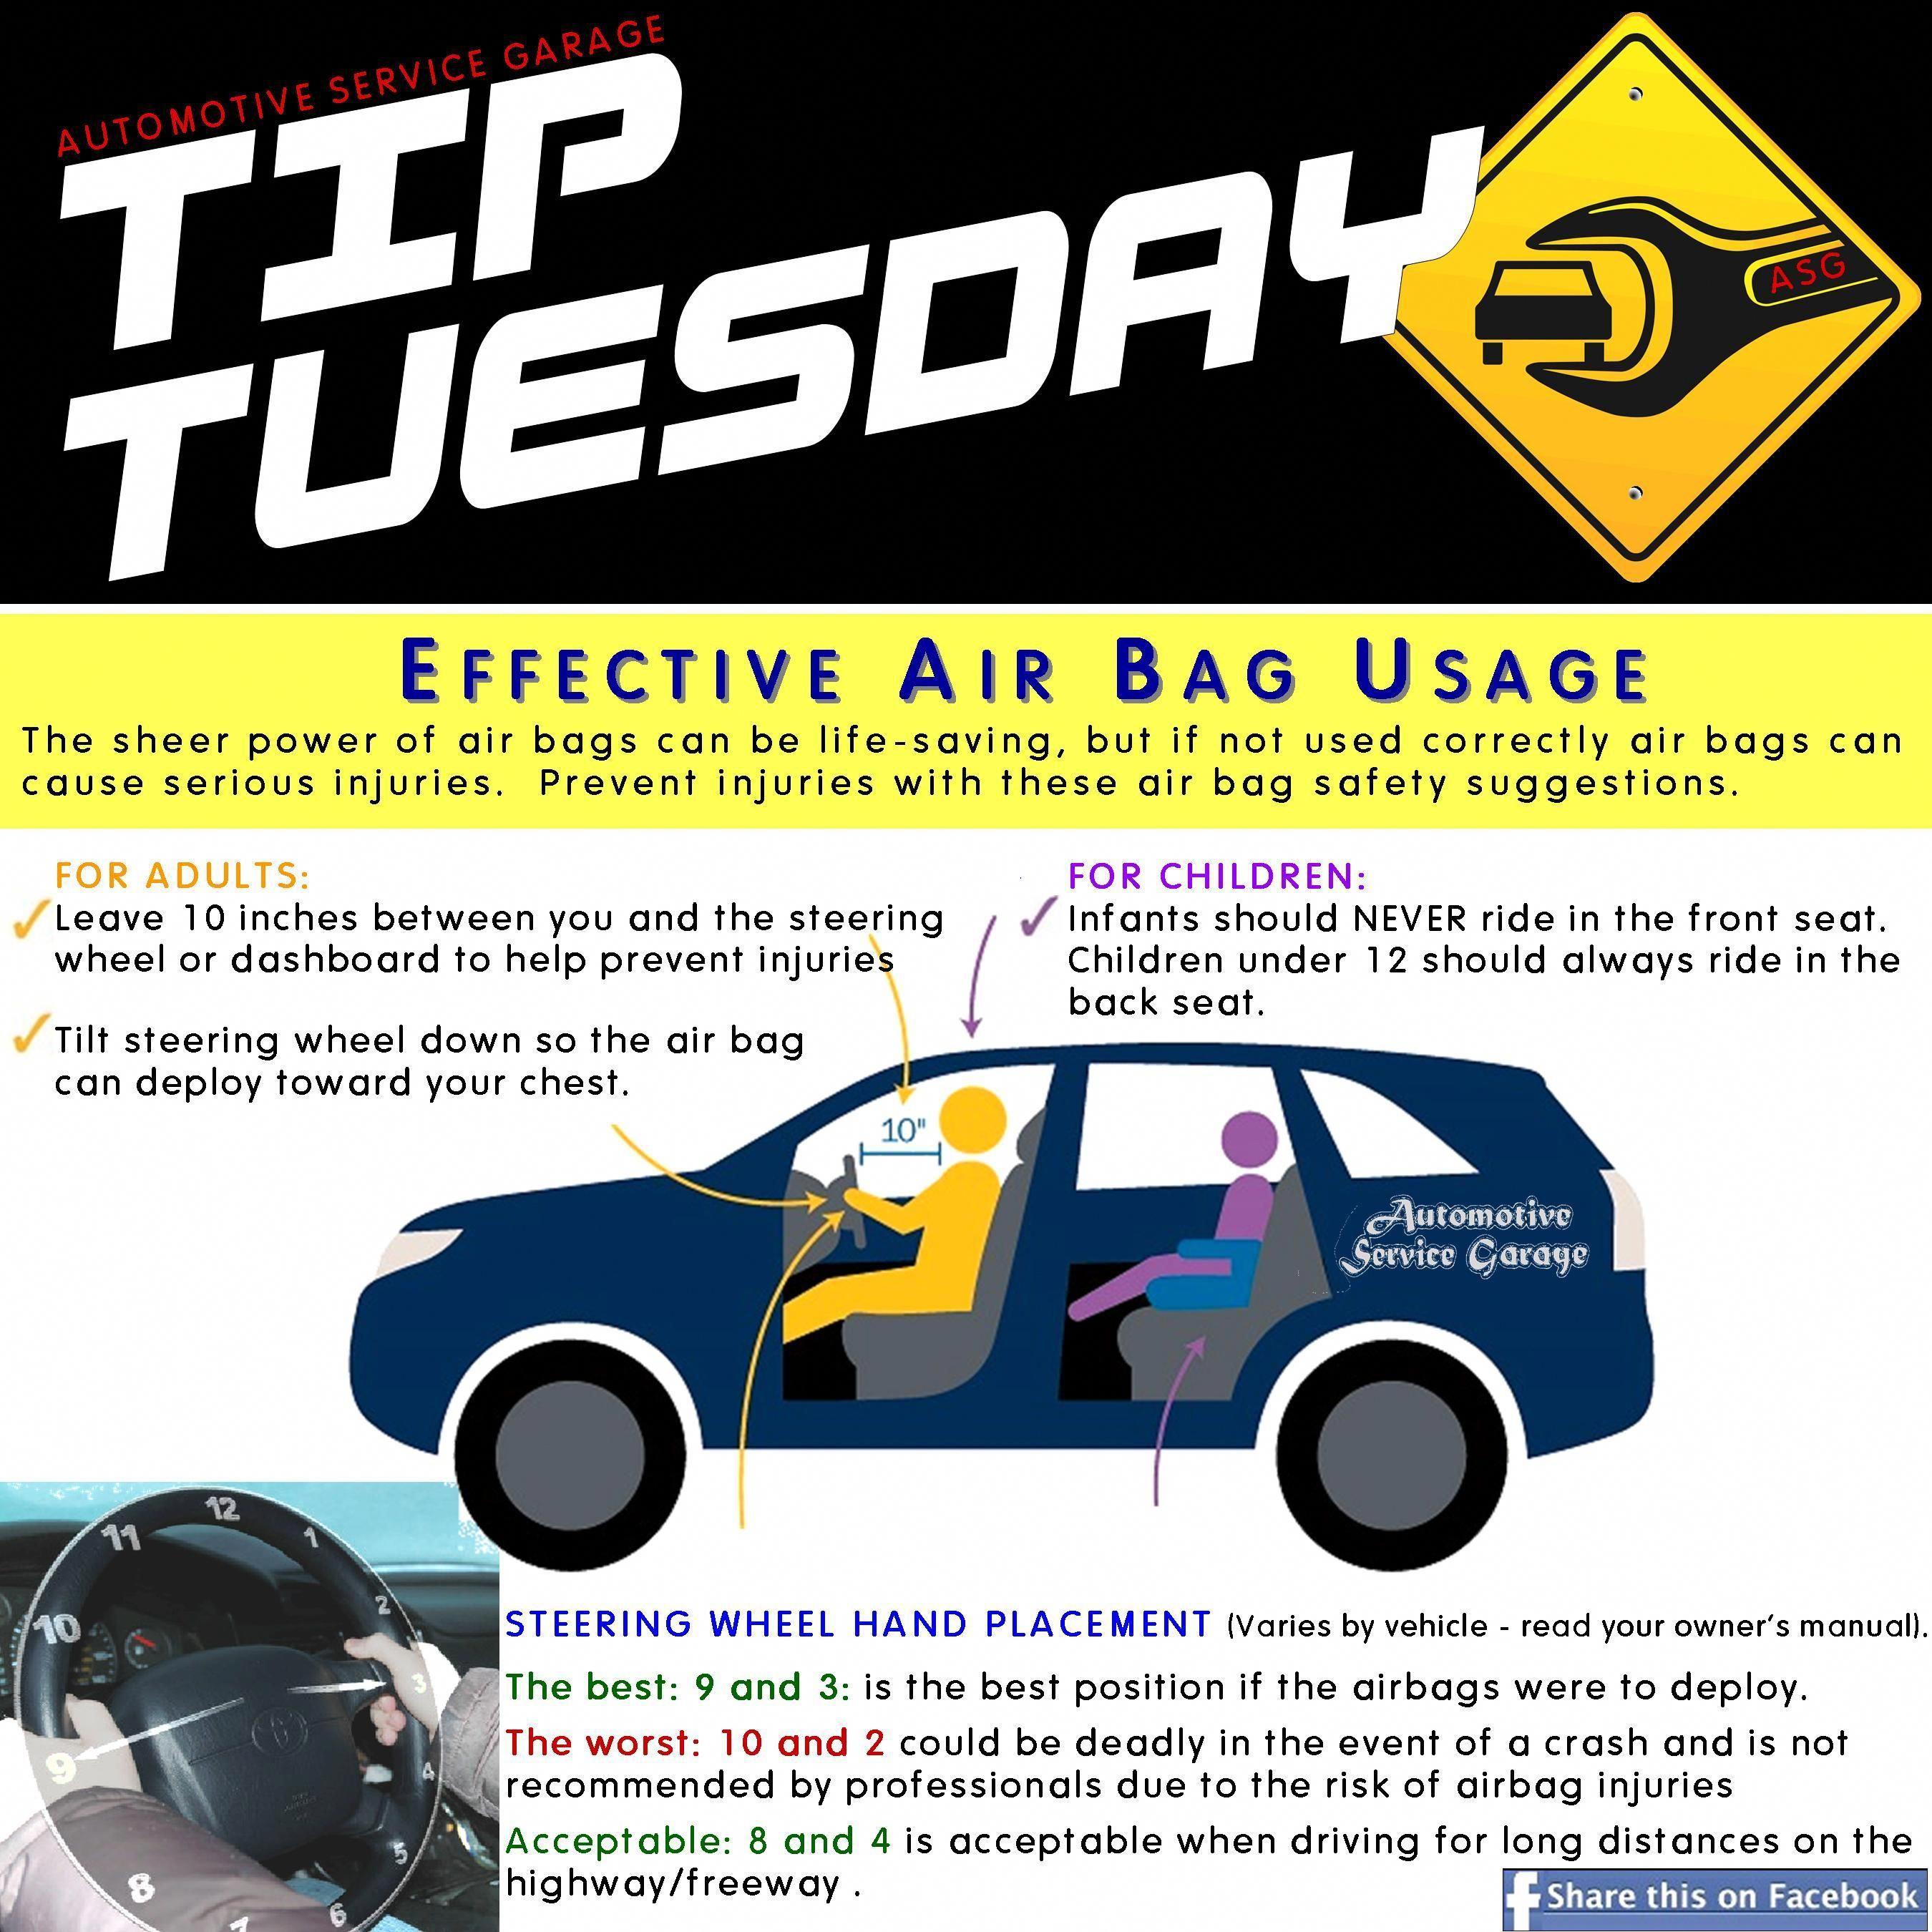 c6b90034580244a246de0bf89fa26060 - How To Get The Airbag Light To Go Off